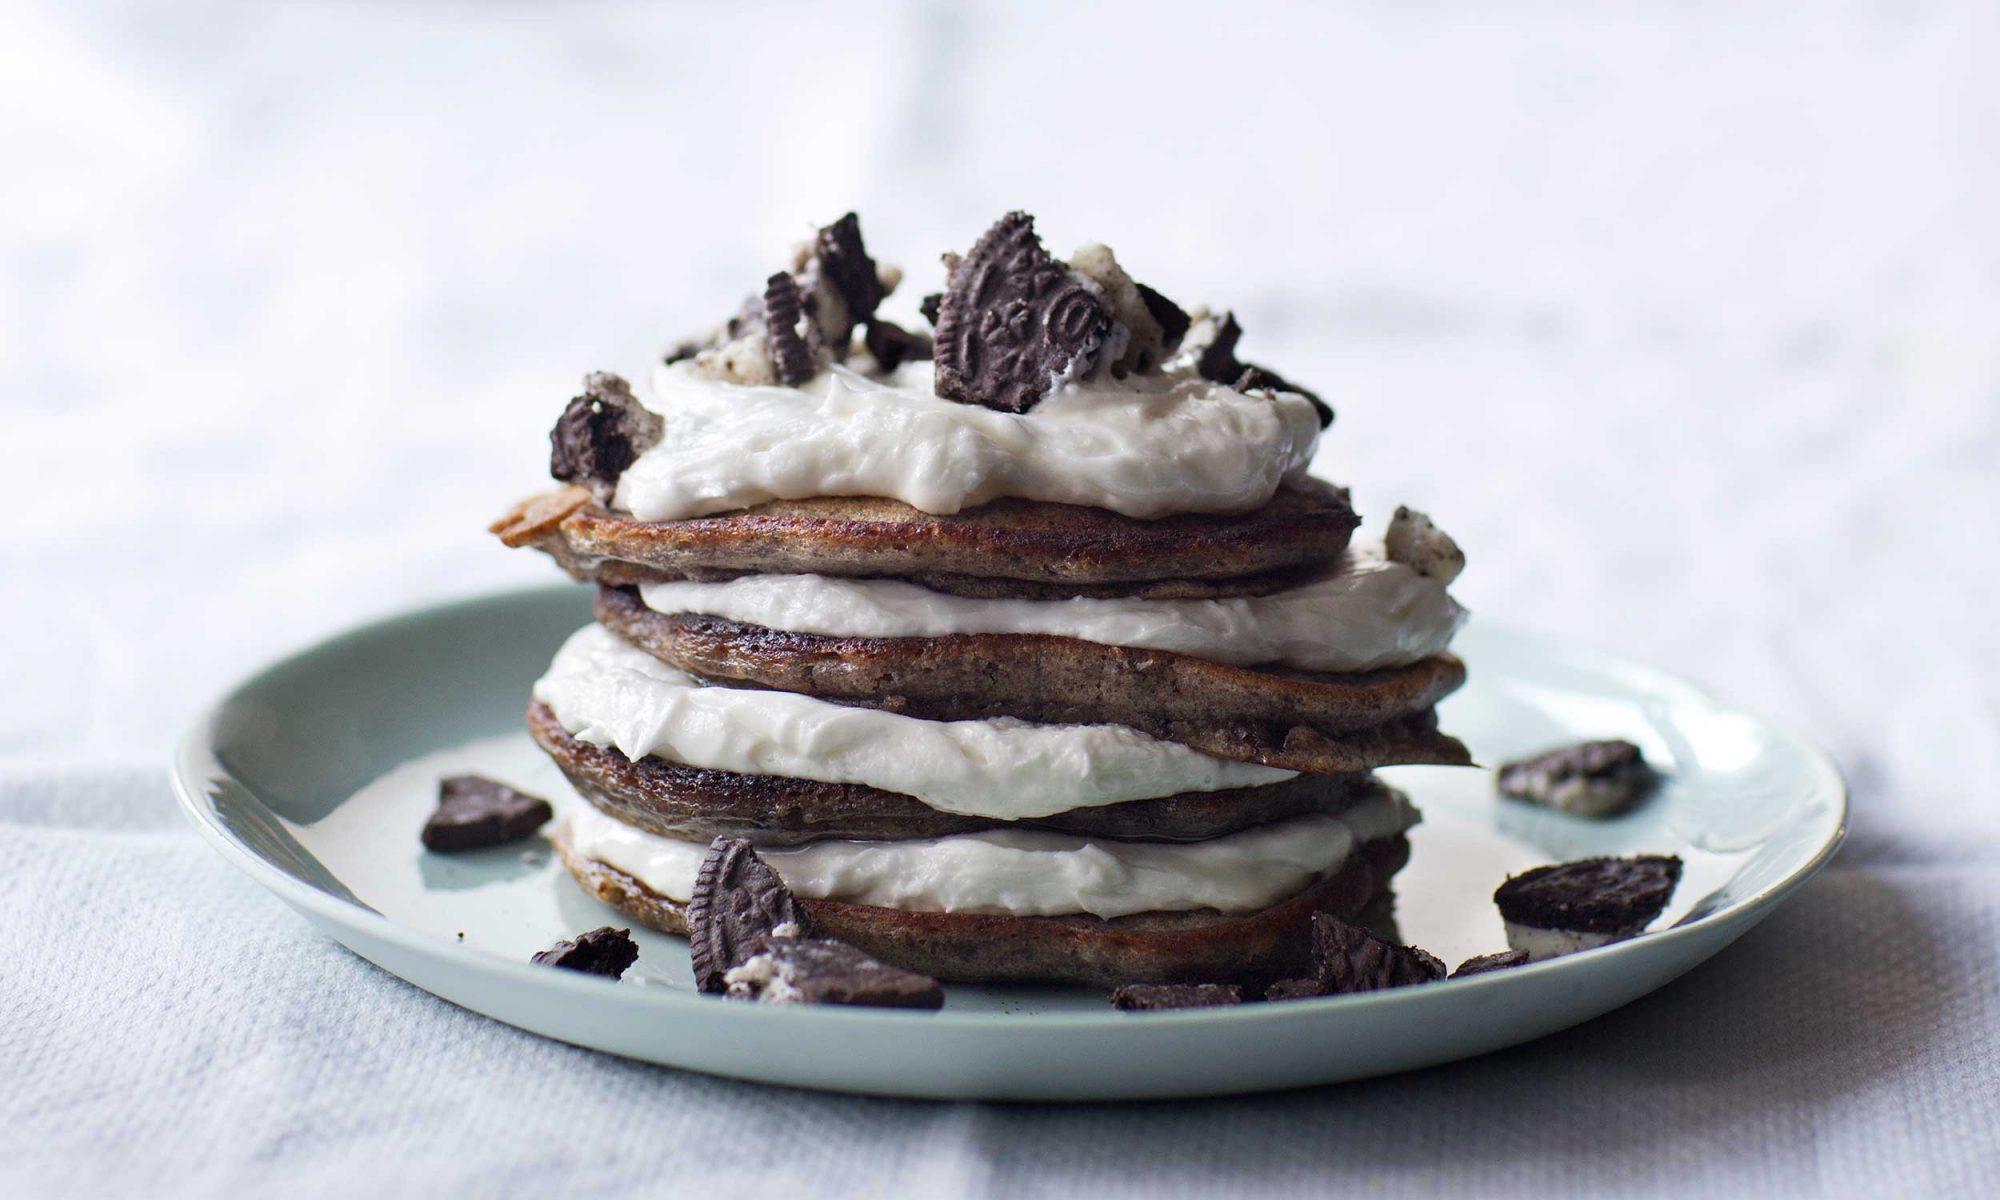 Chris Santos's Oreo Pancake Recipe Is a Brunch-Party Pleaser